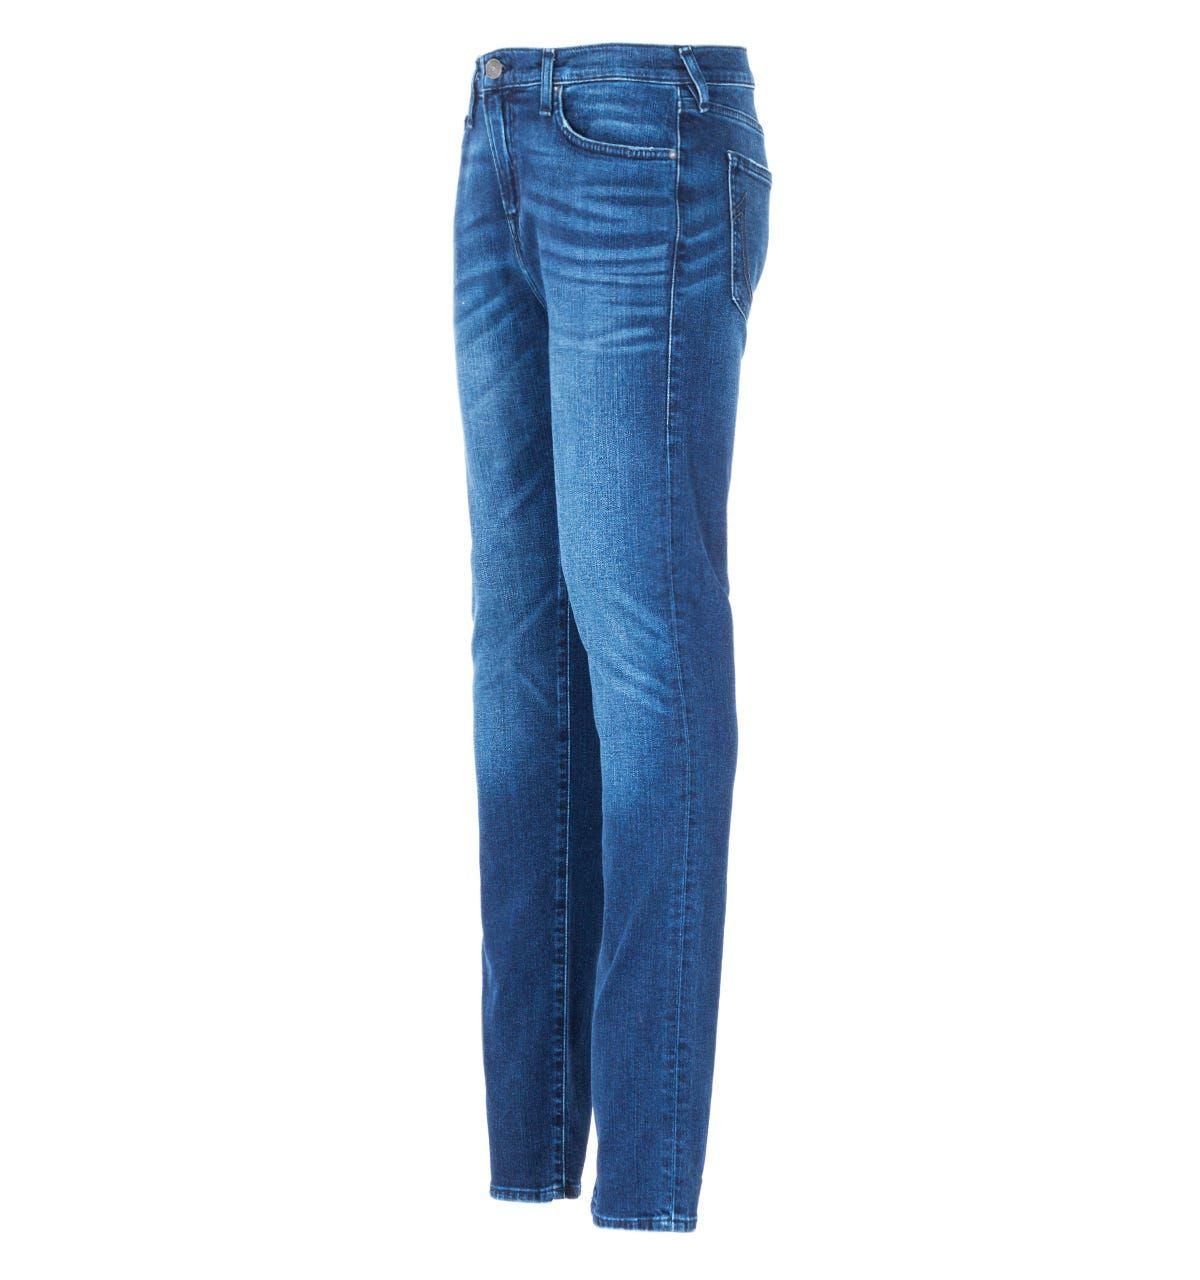 True Religion Rocco Skinny Jeans - Urban Cowboy Blue